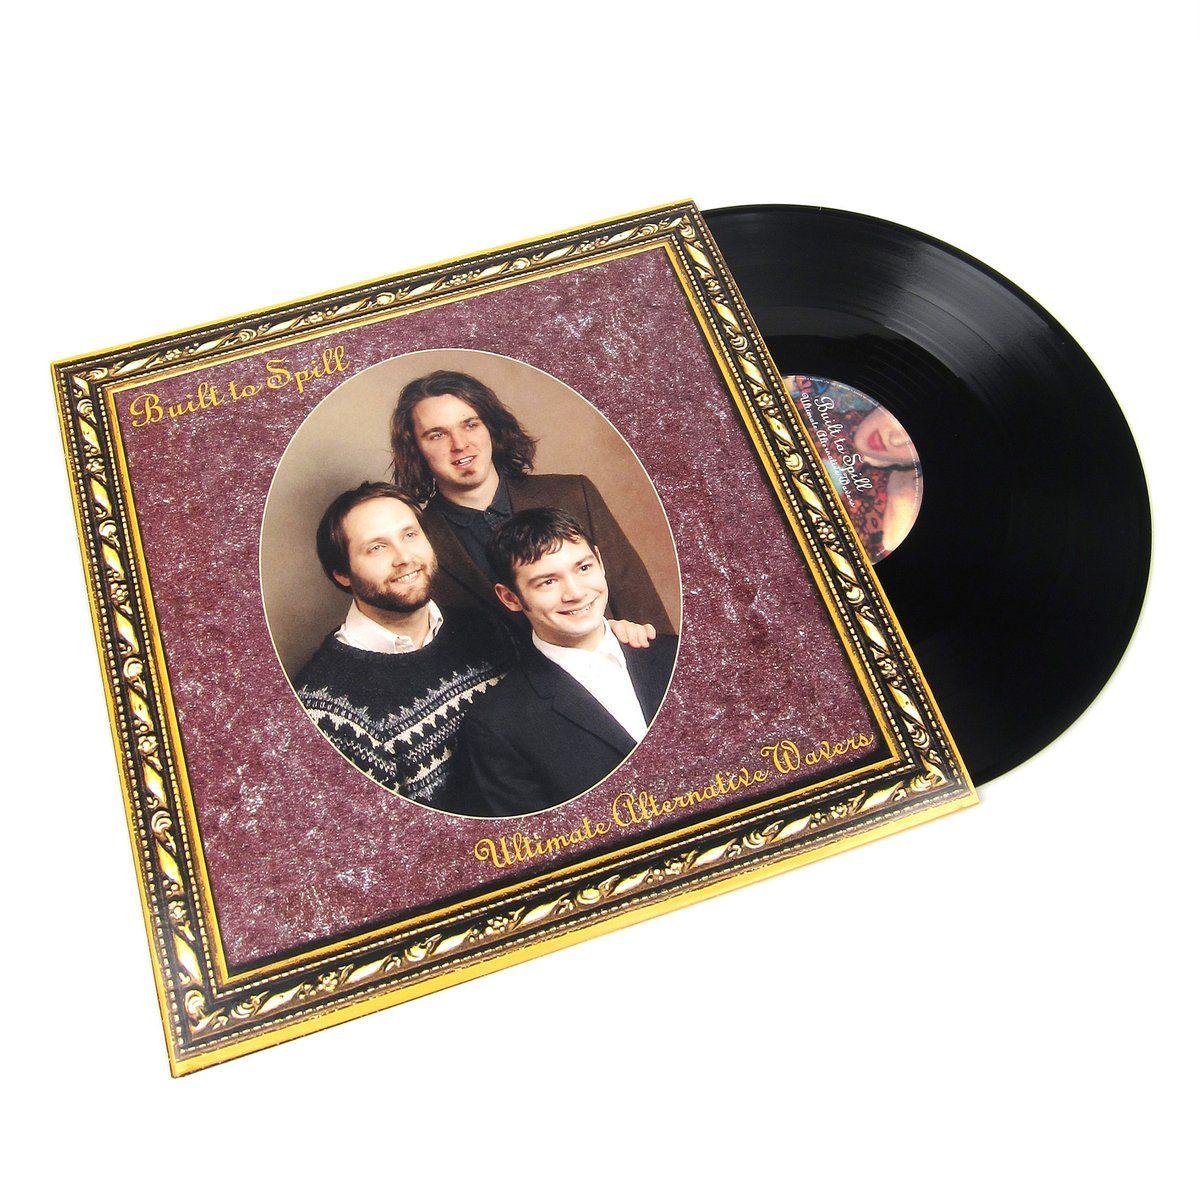 Built To Spill Ultimate Alternative Wavers Vinyl 2lp Built To Spill Better Music Indie